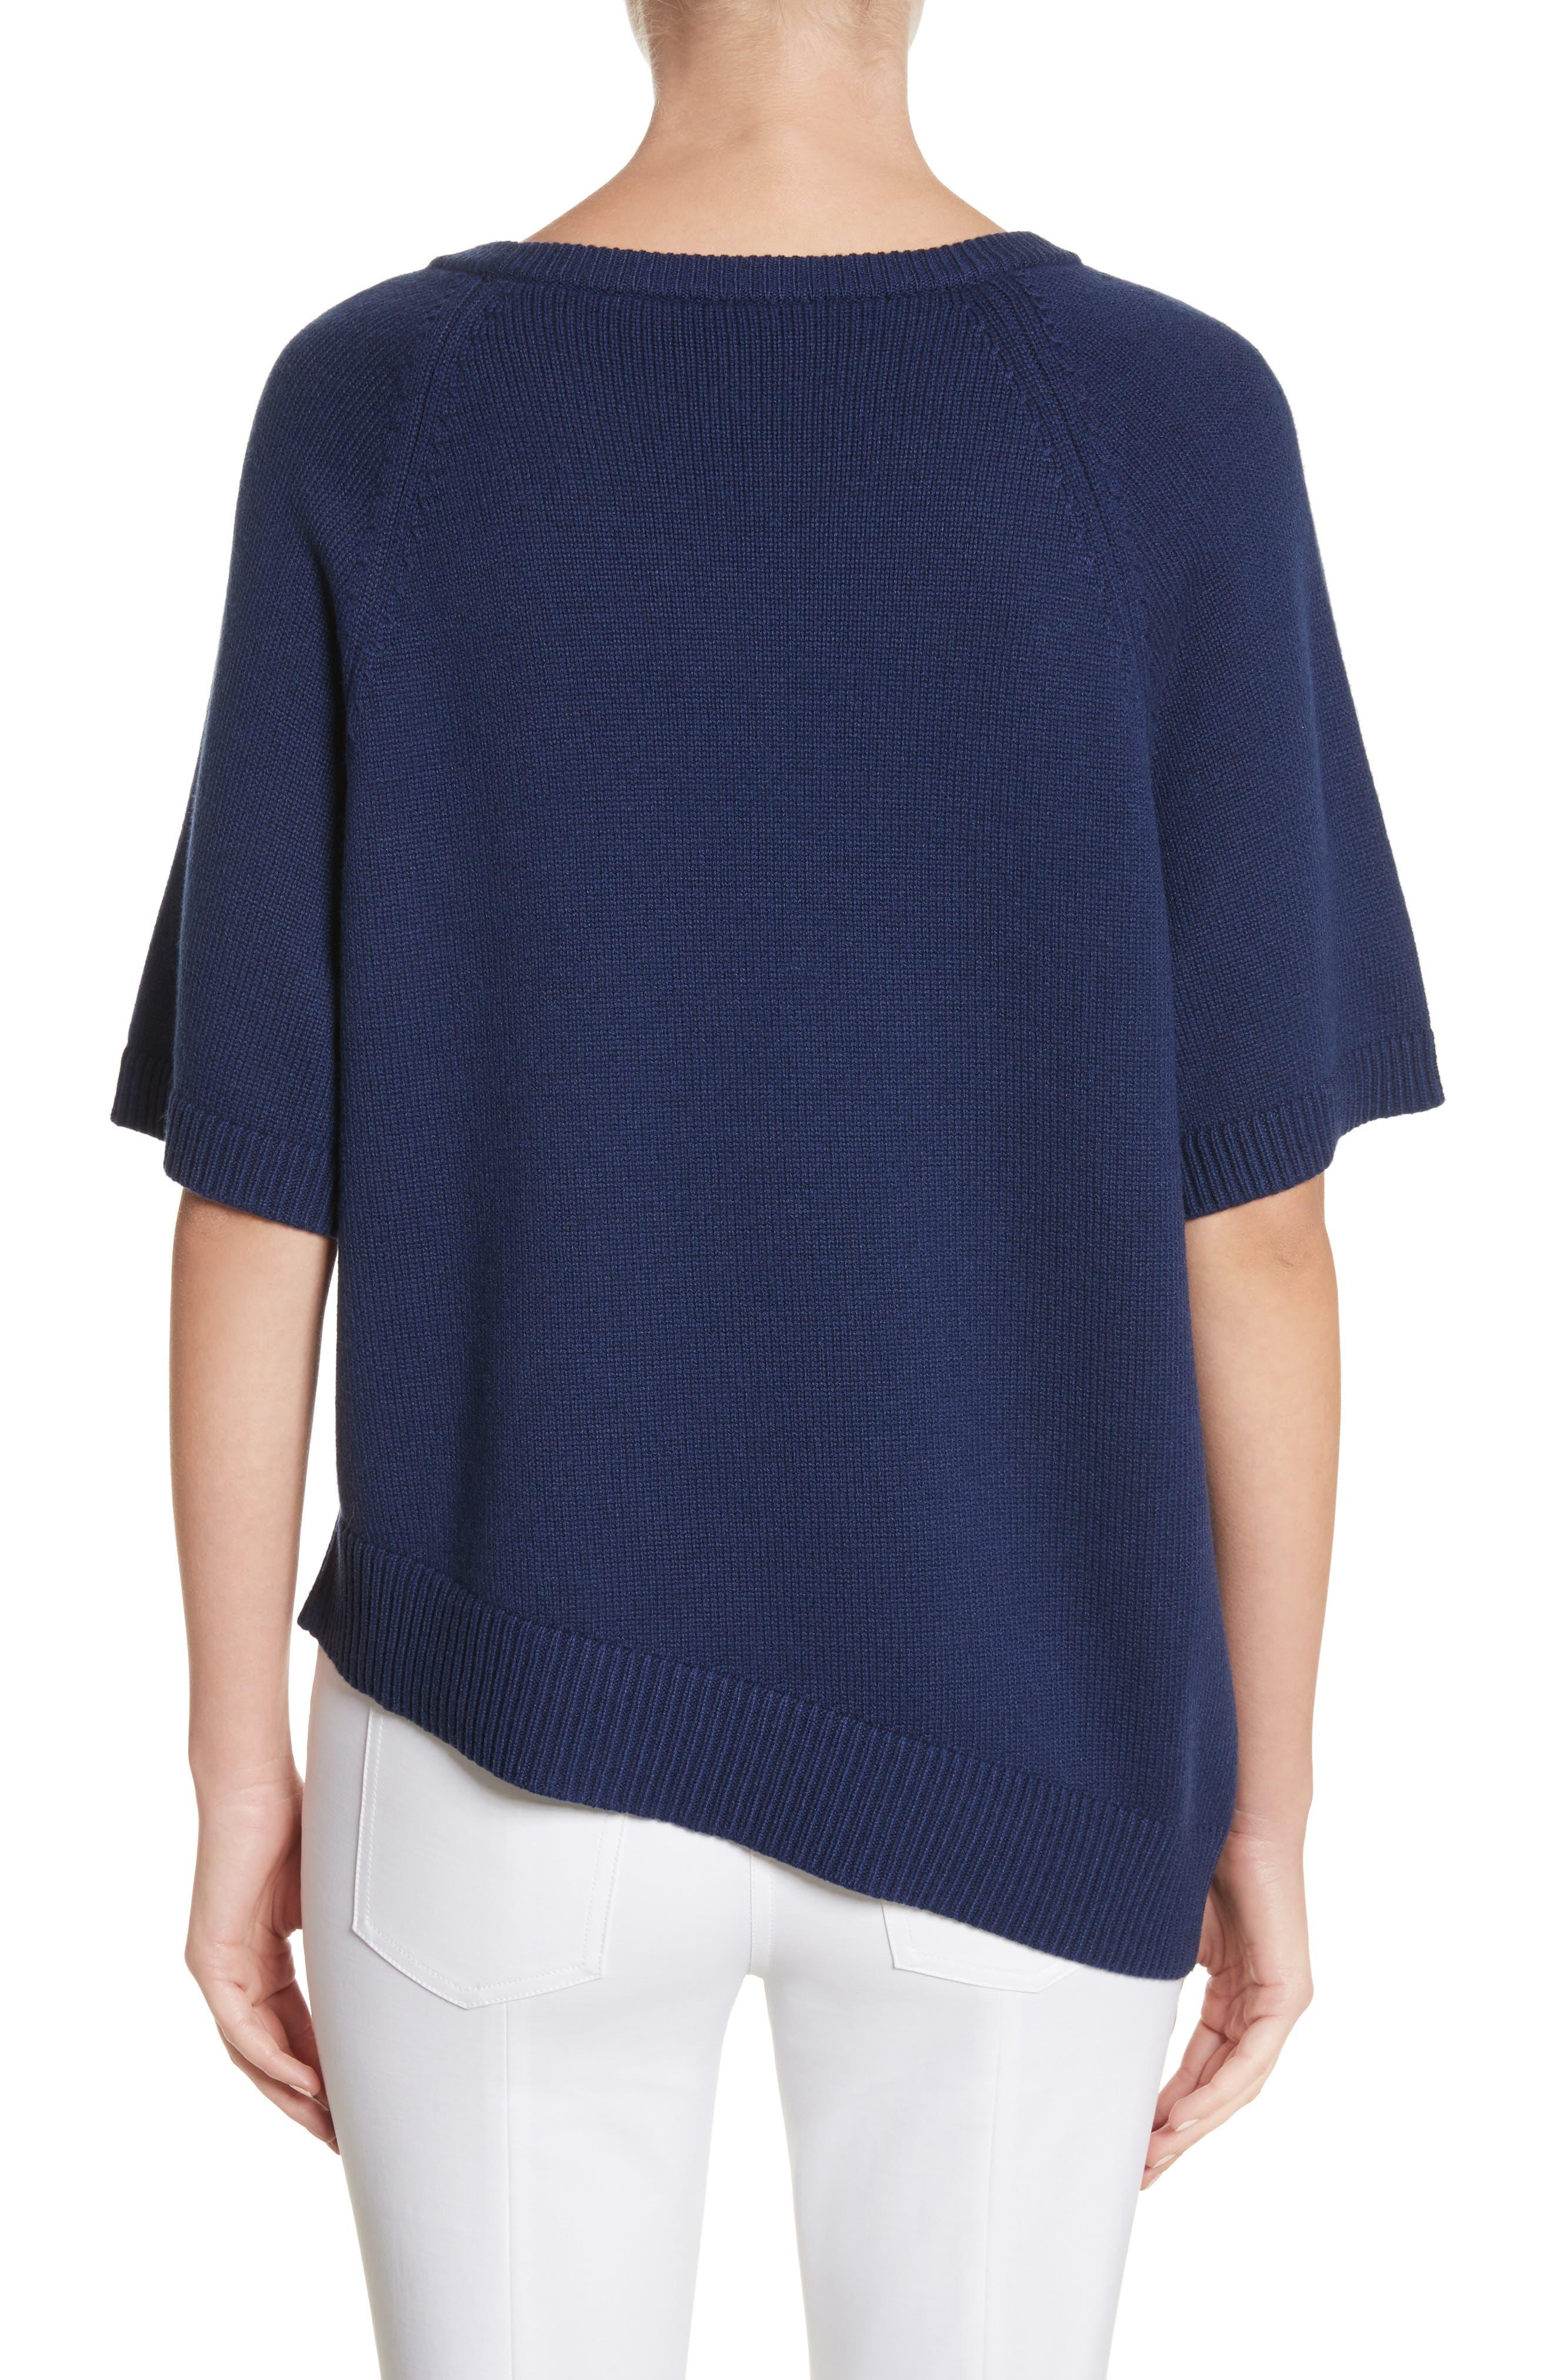 Alternate Image 2  - Michael Kors Asymmetrical Cashmere Pullover